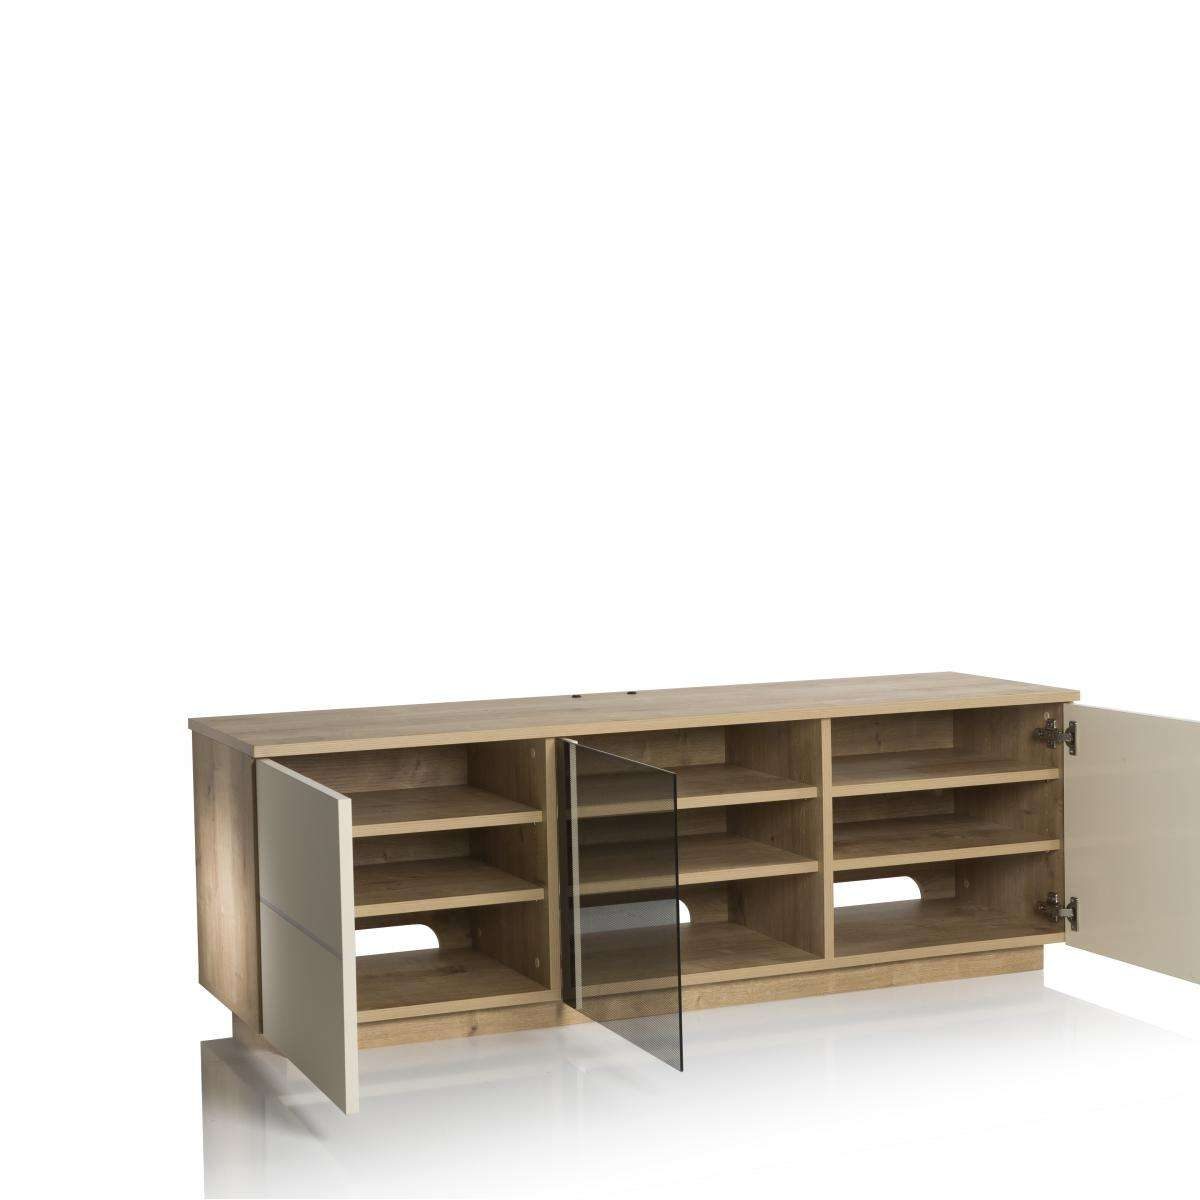 New London 150cm Tv Cabinet Oak /cream | Nldn Oak Cr Inside Cream High Gloss Tv Cabinets (View 19 of 20)